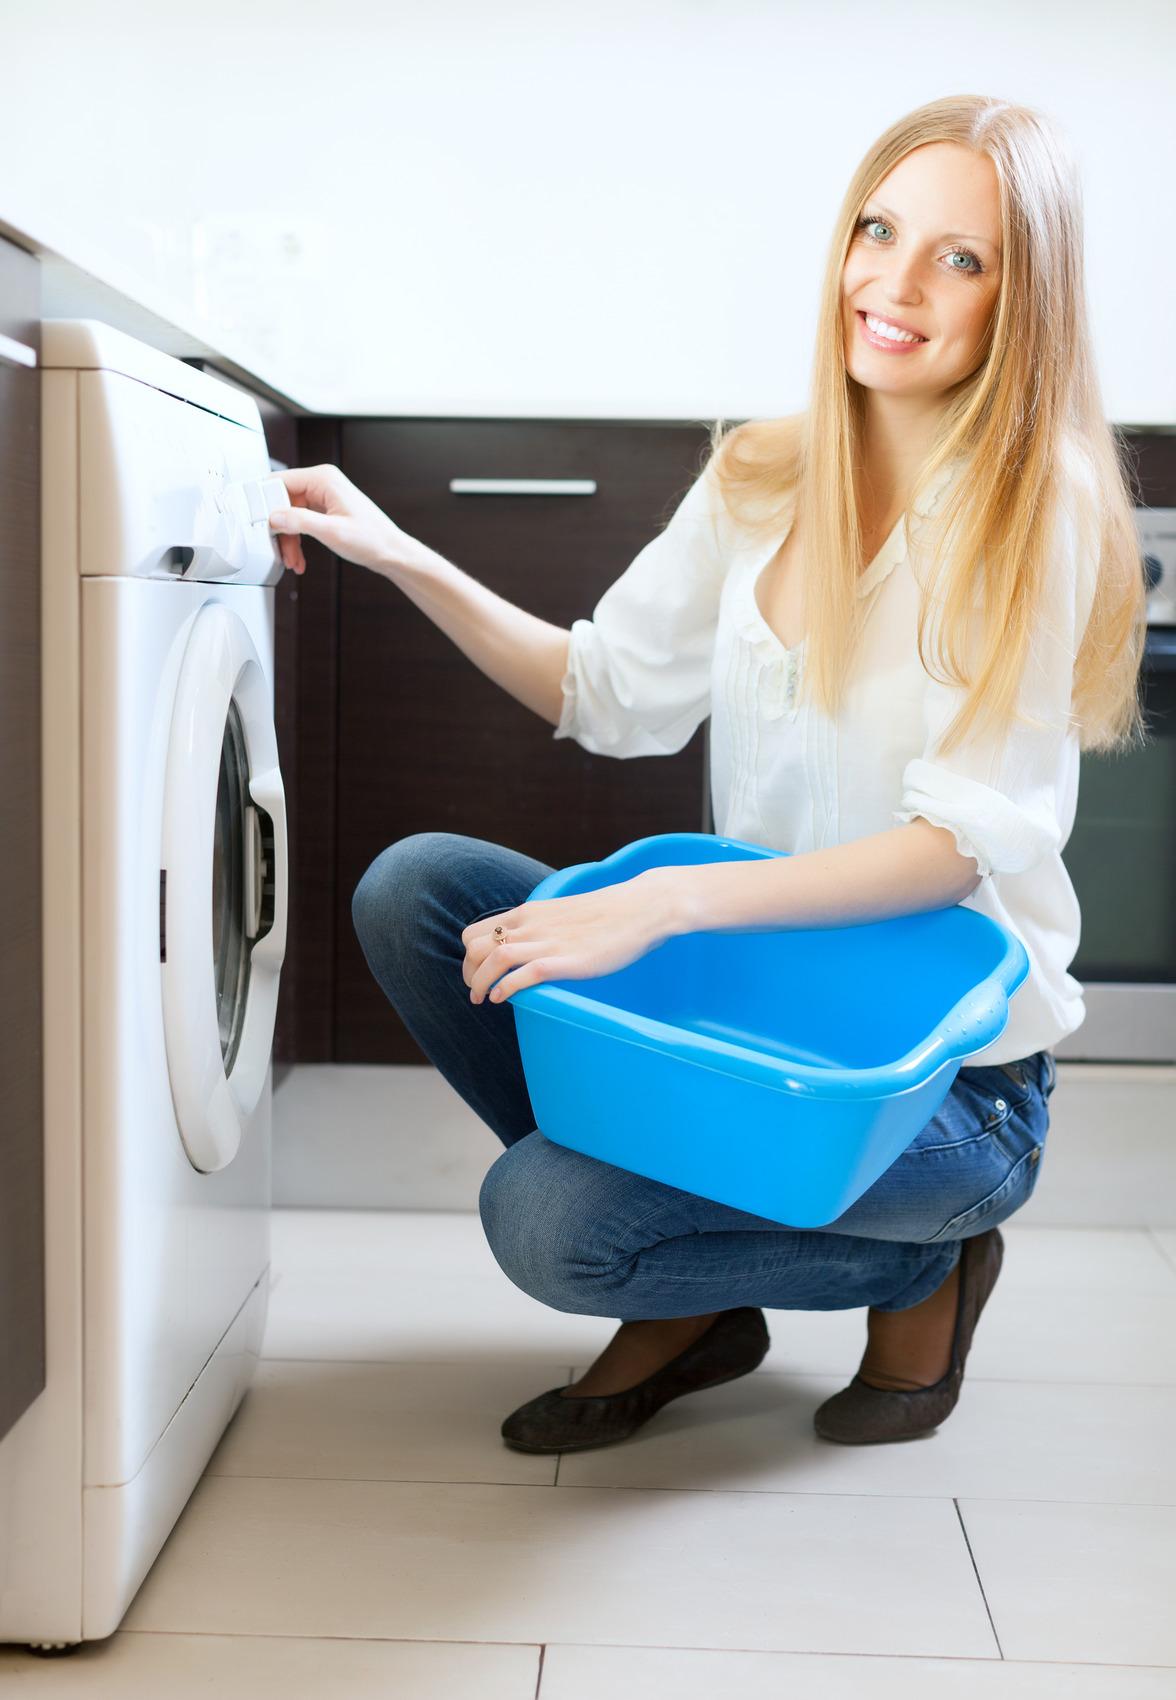 photodune-5252033-longhaired-woman-using-washing-machine-m b795a